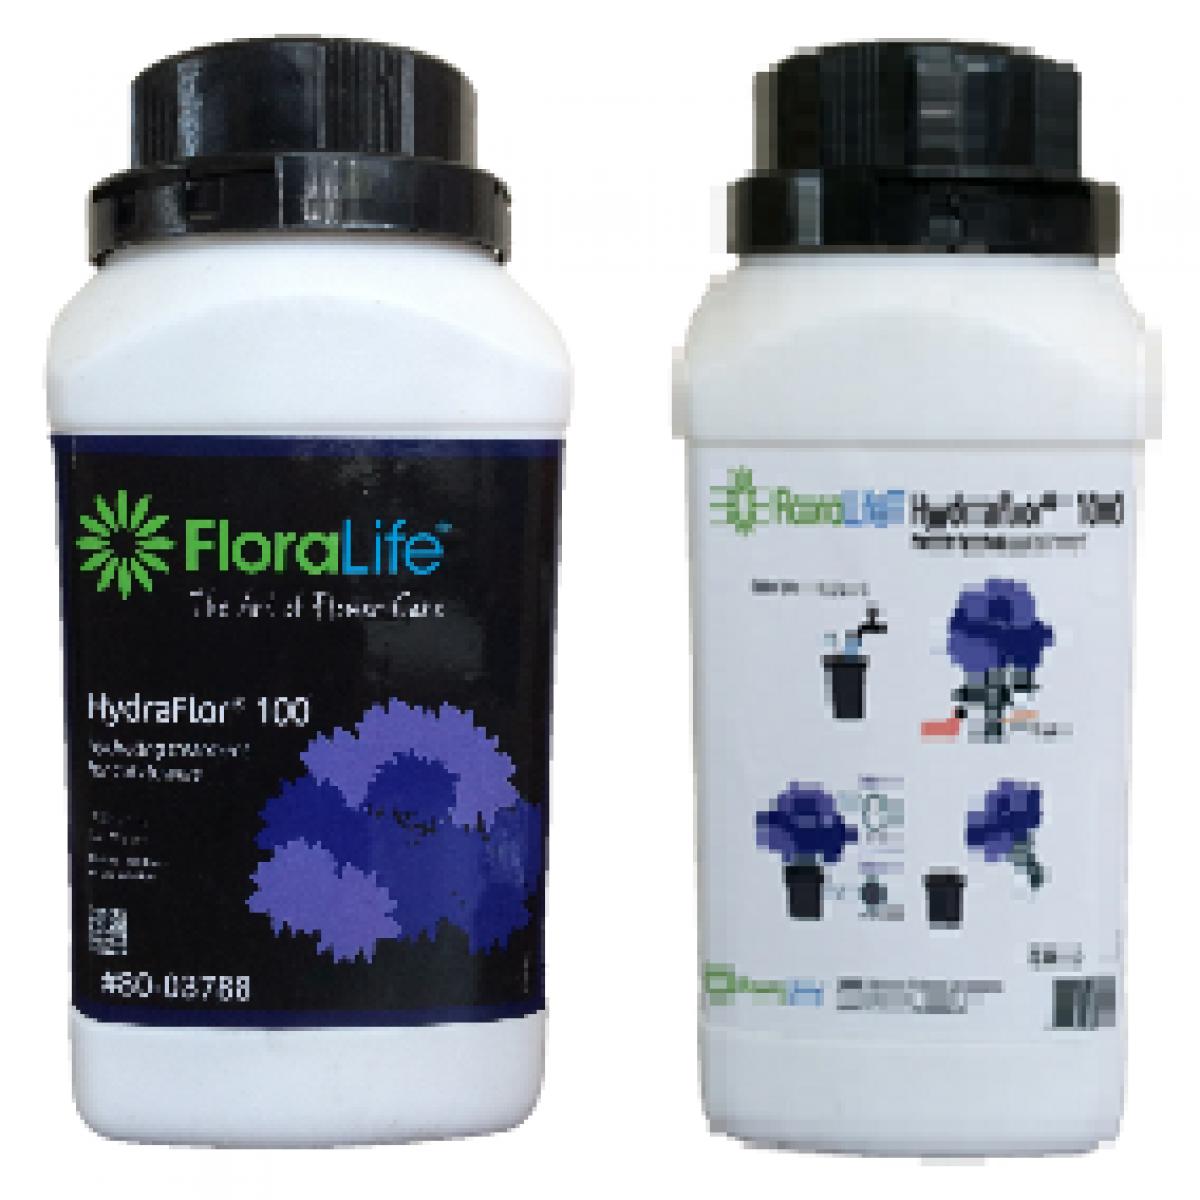 1101 Floralife® Hydraflor 100 750 gms  - 1 No